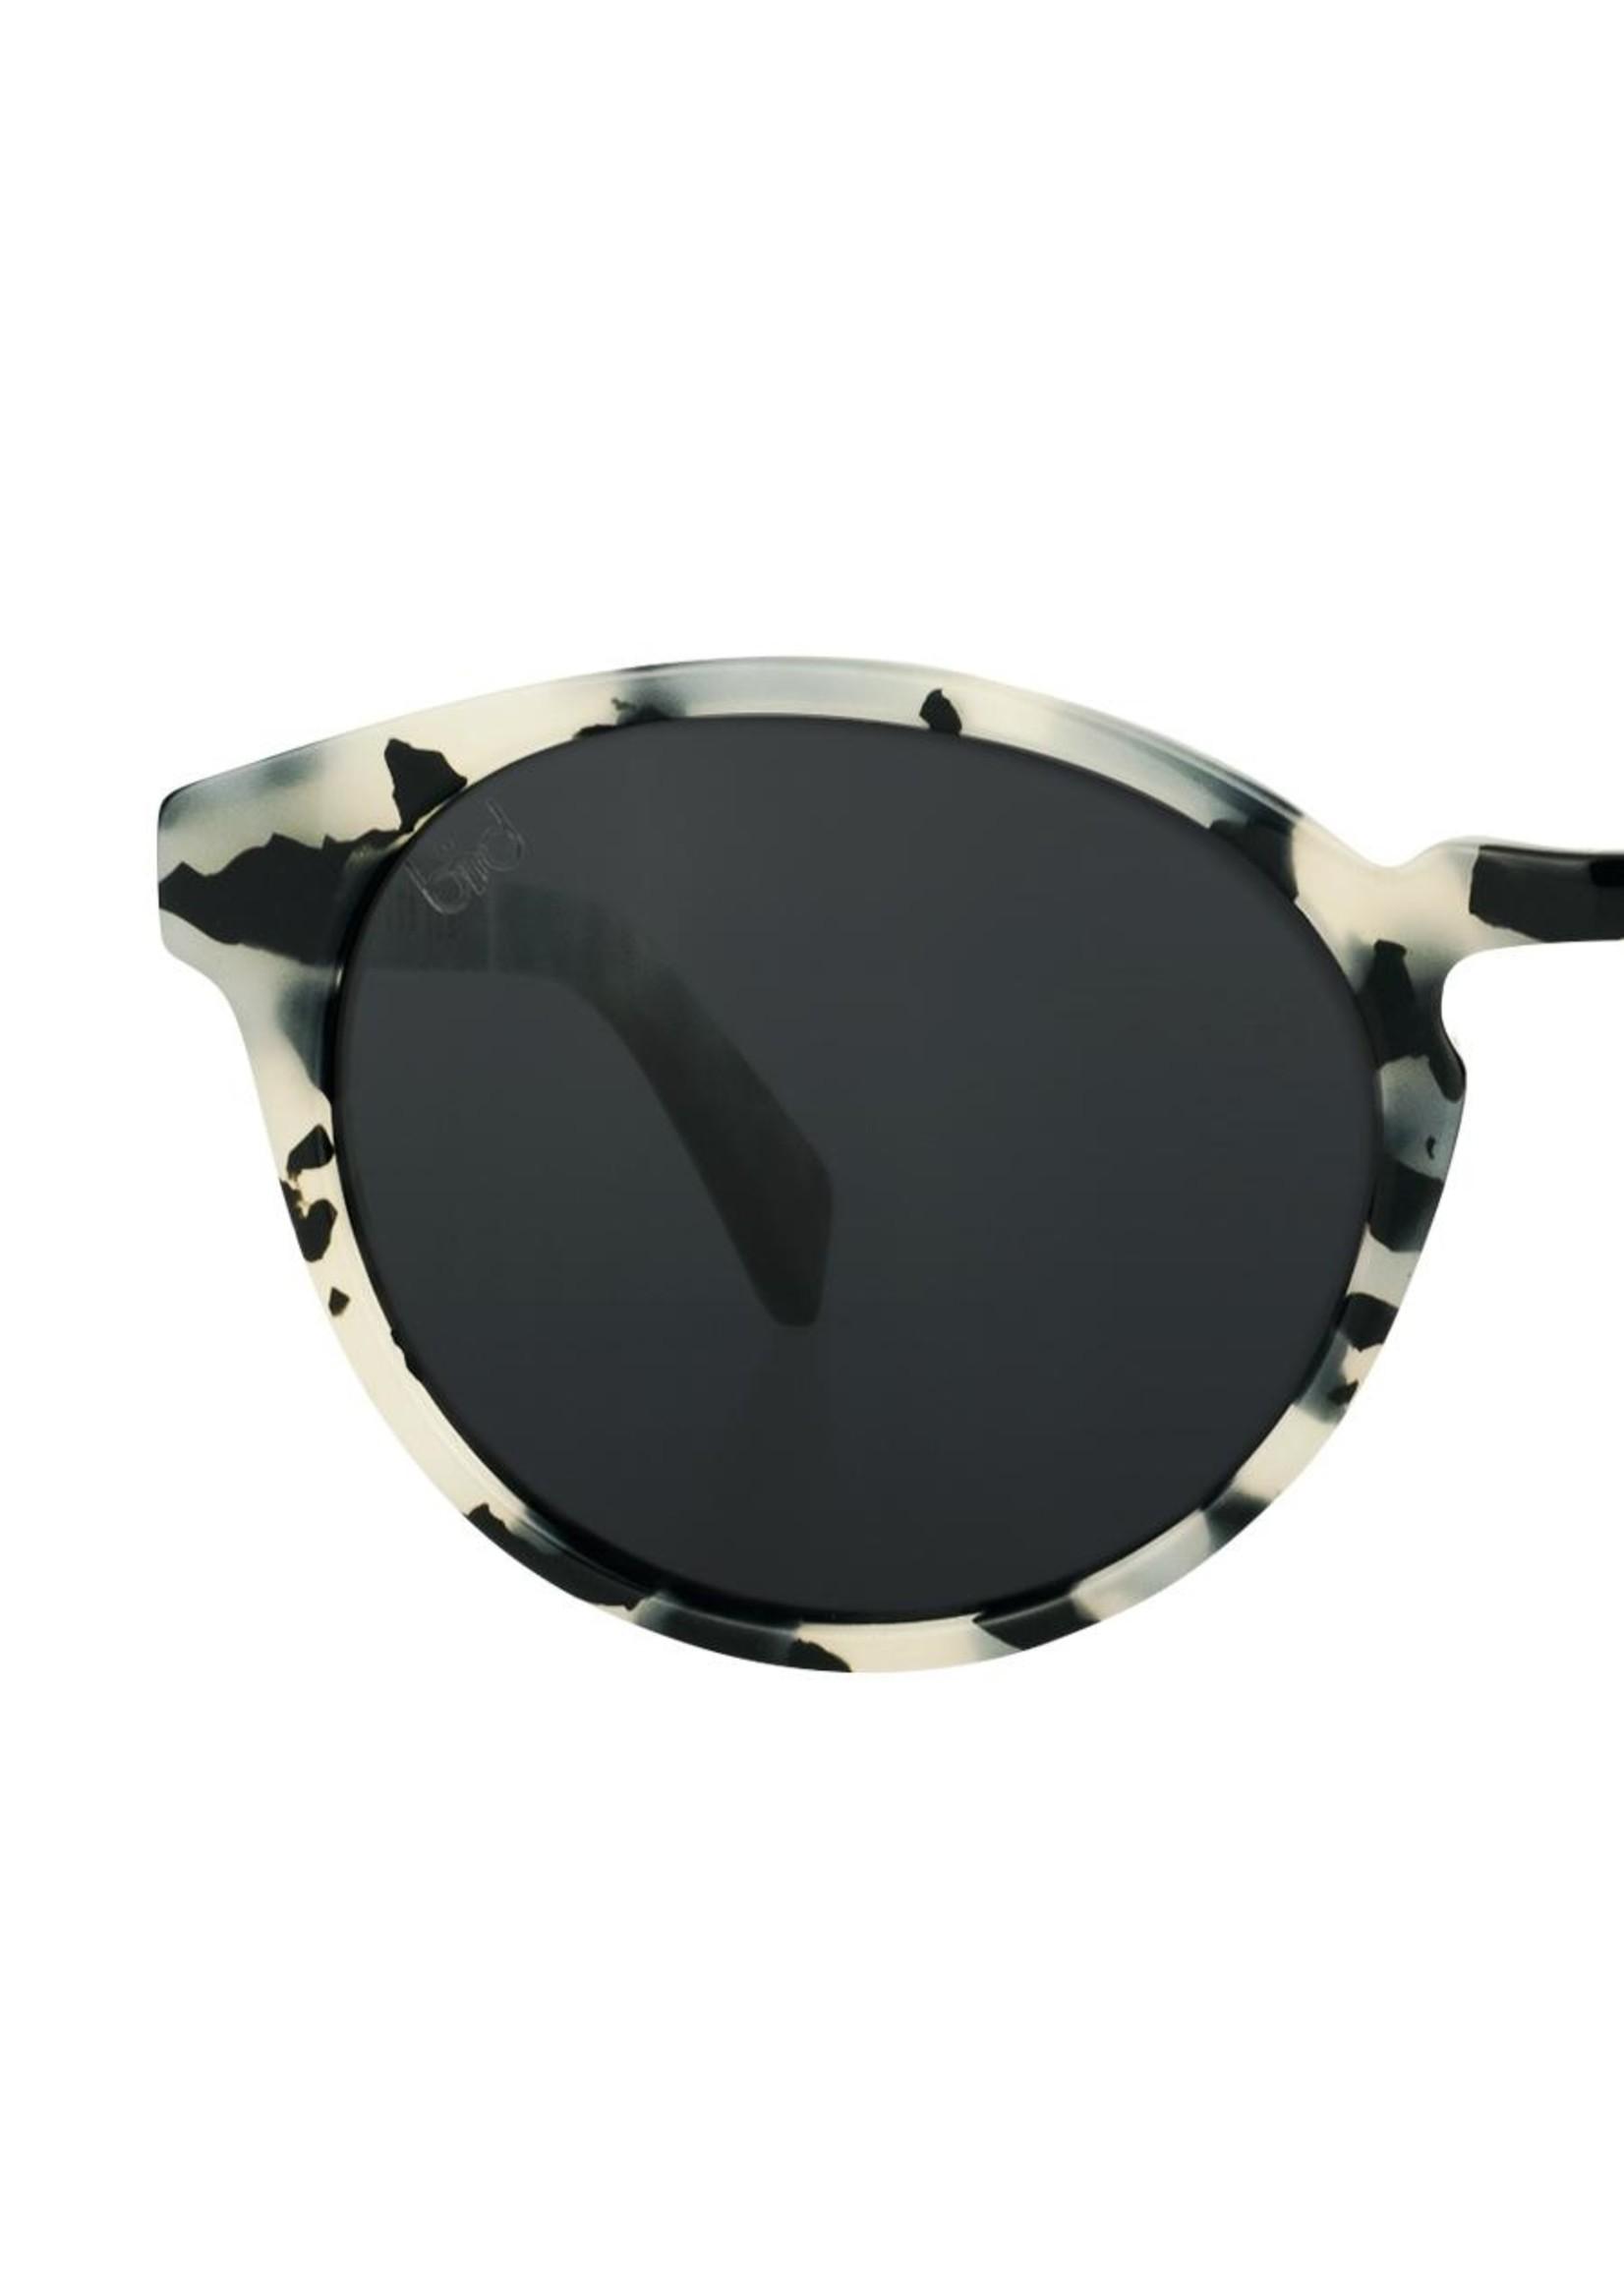 Bird Eyewear Bird Kaka Sunglasses - Snowy